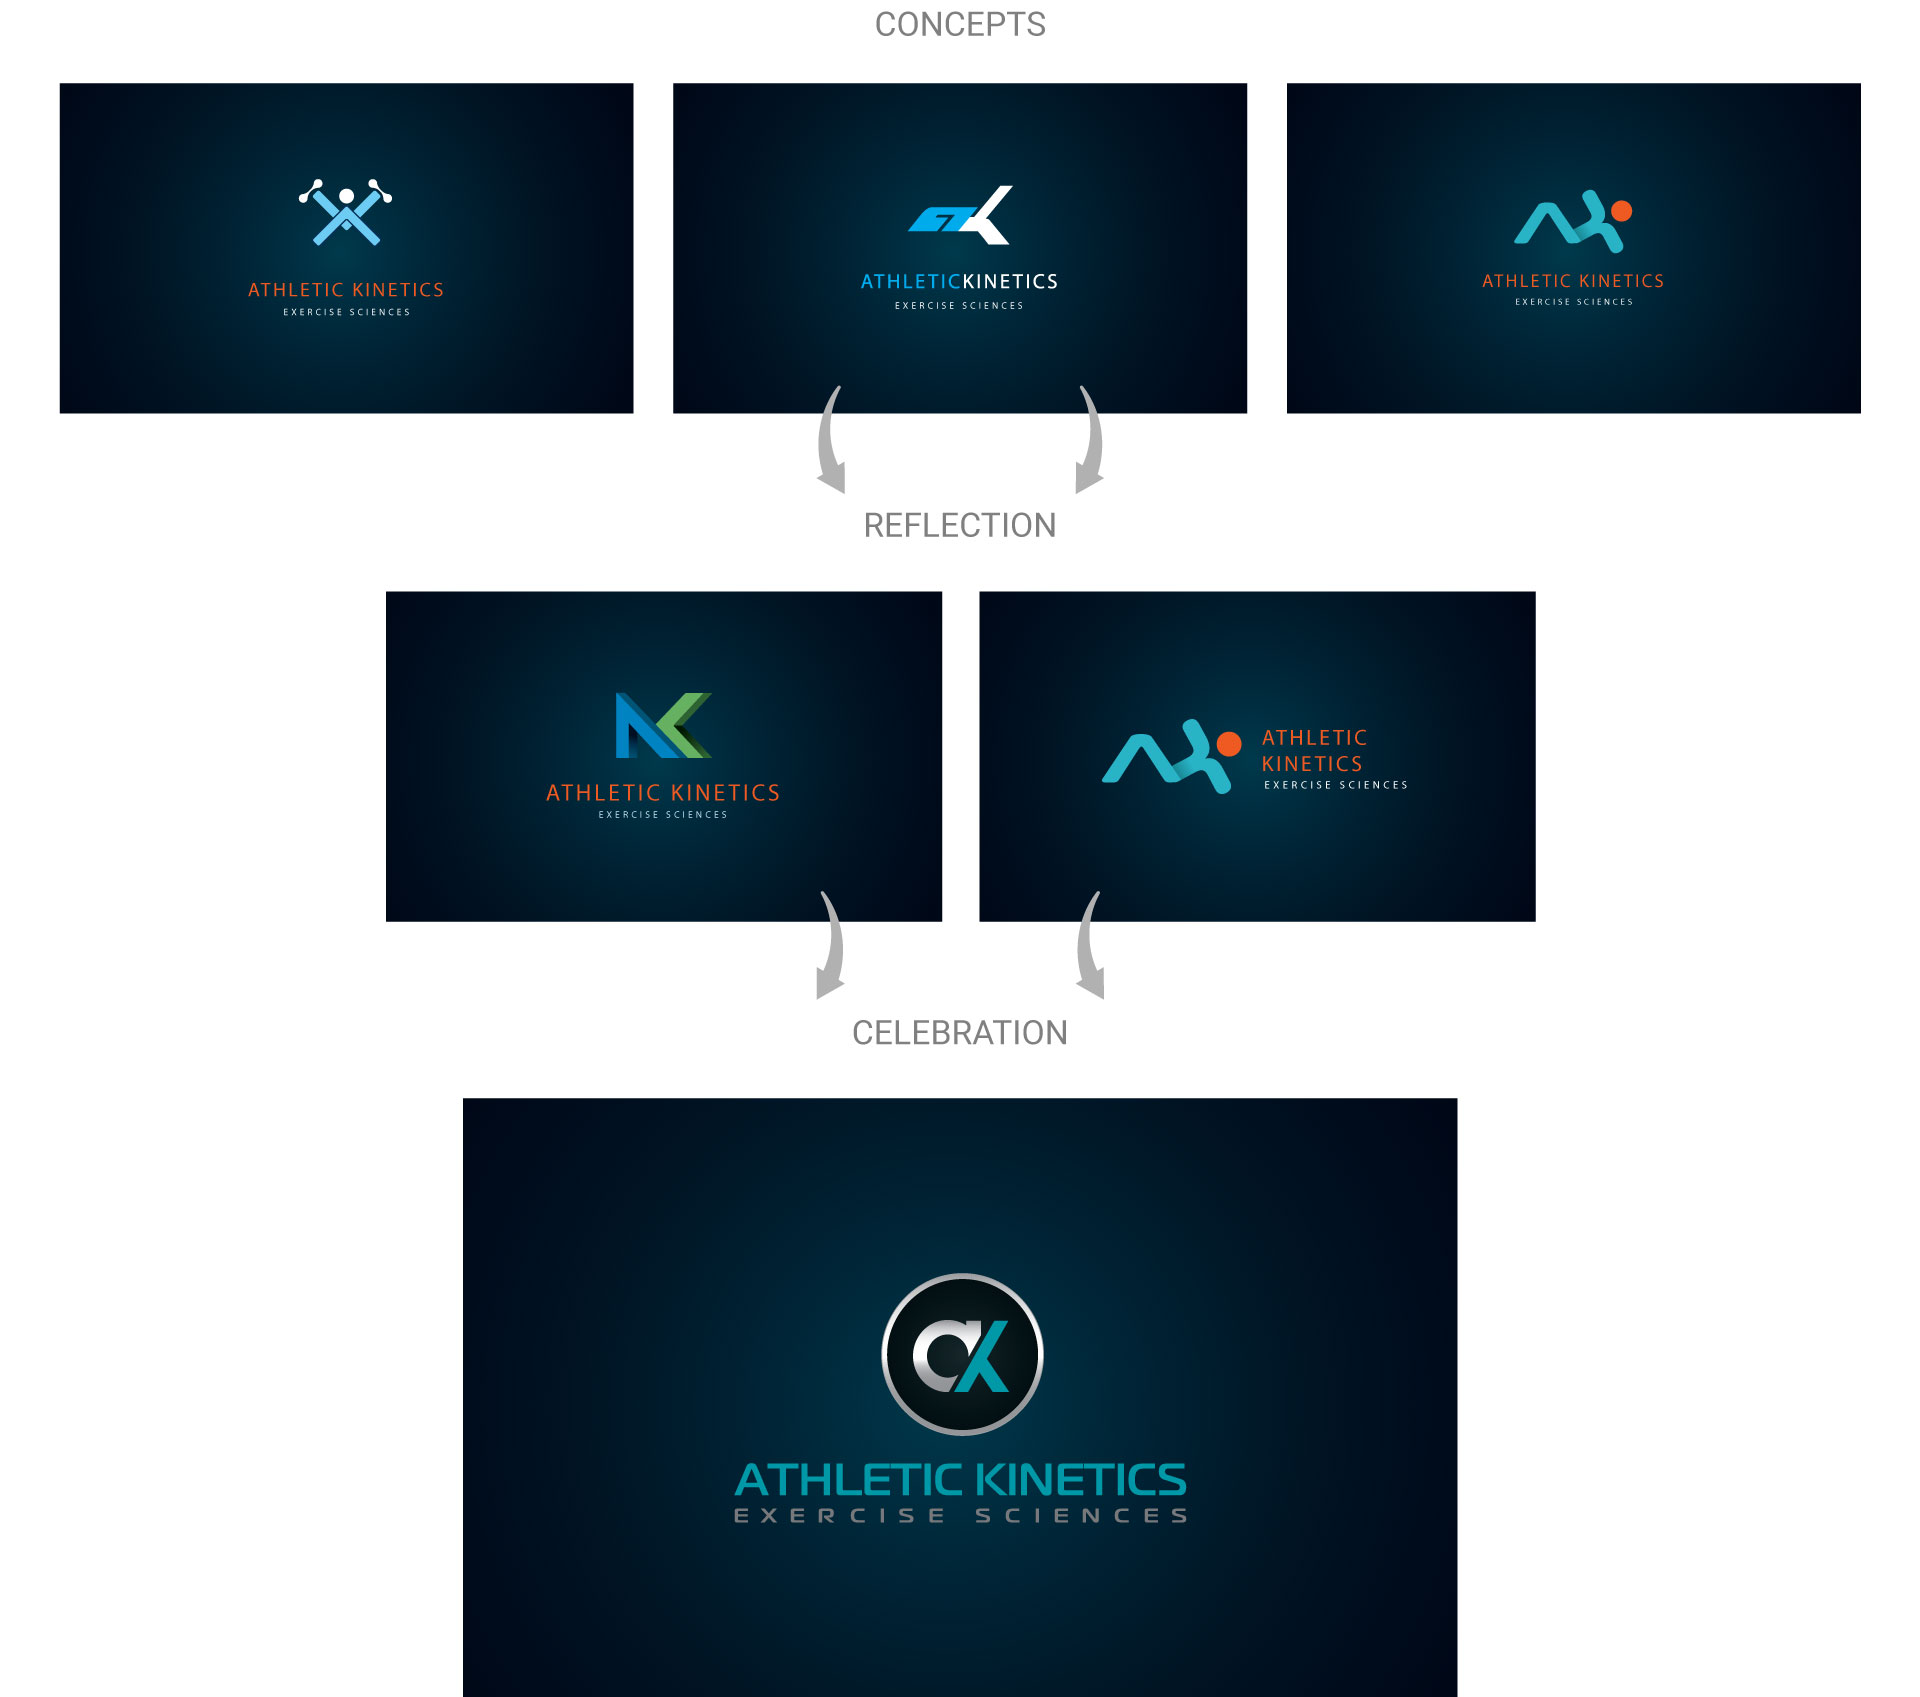 athletic-kinetics-logo-design-process-by-mapleweb-vancouver-canada